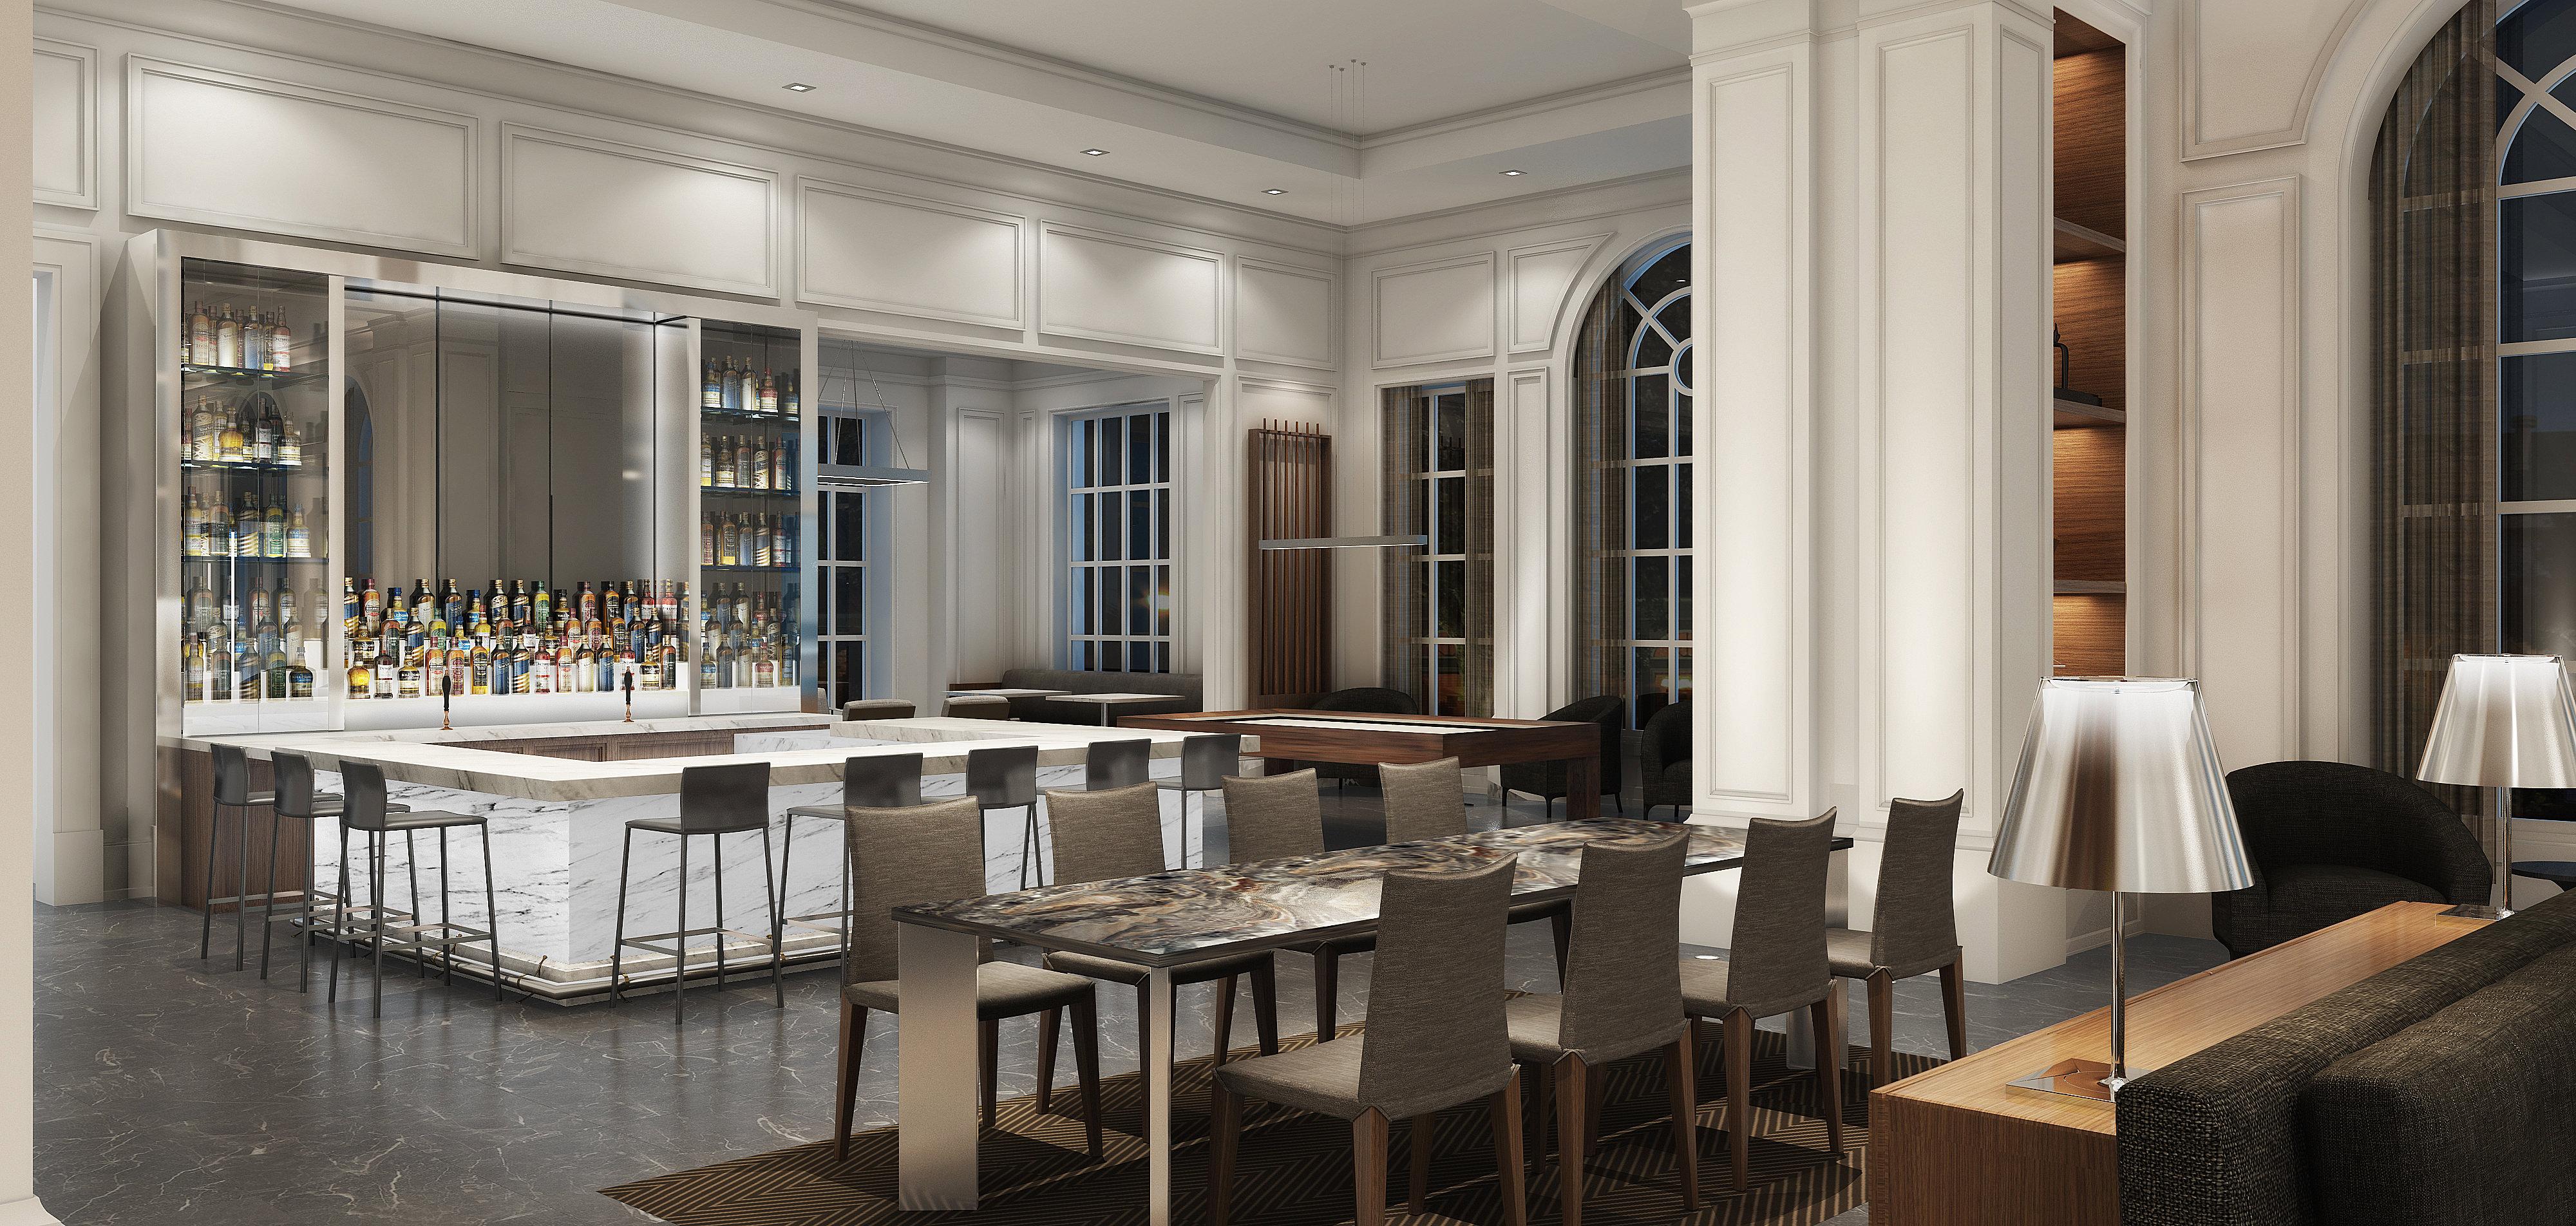 Downtown Spartanburg 39 S Ac Hotel Completes Final Floor Reveals Interior Renderings Oto Development